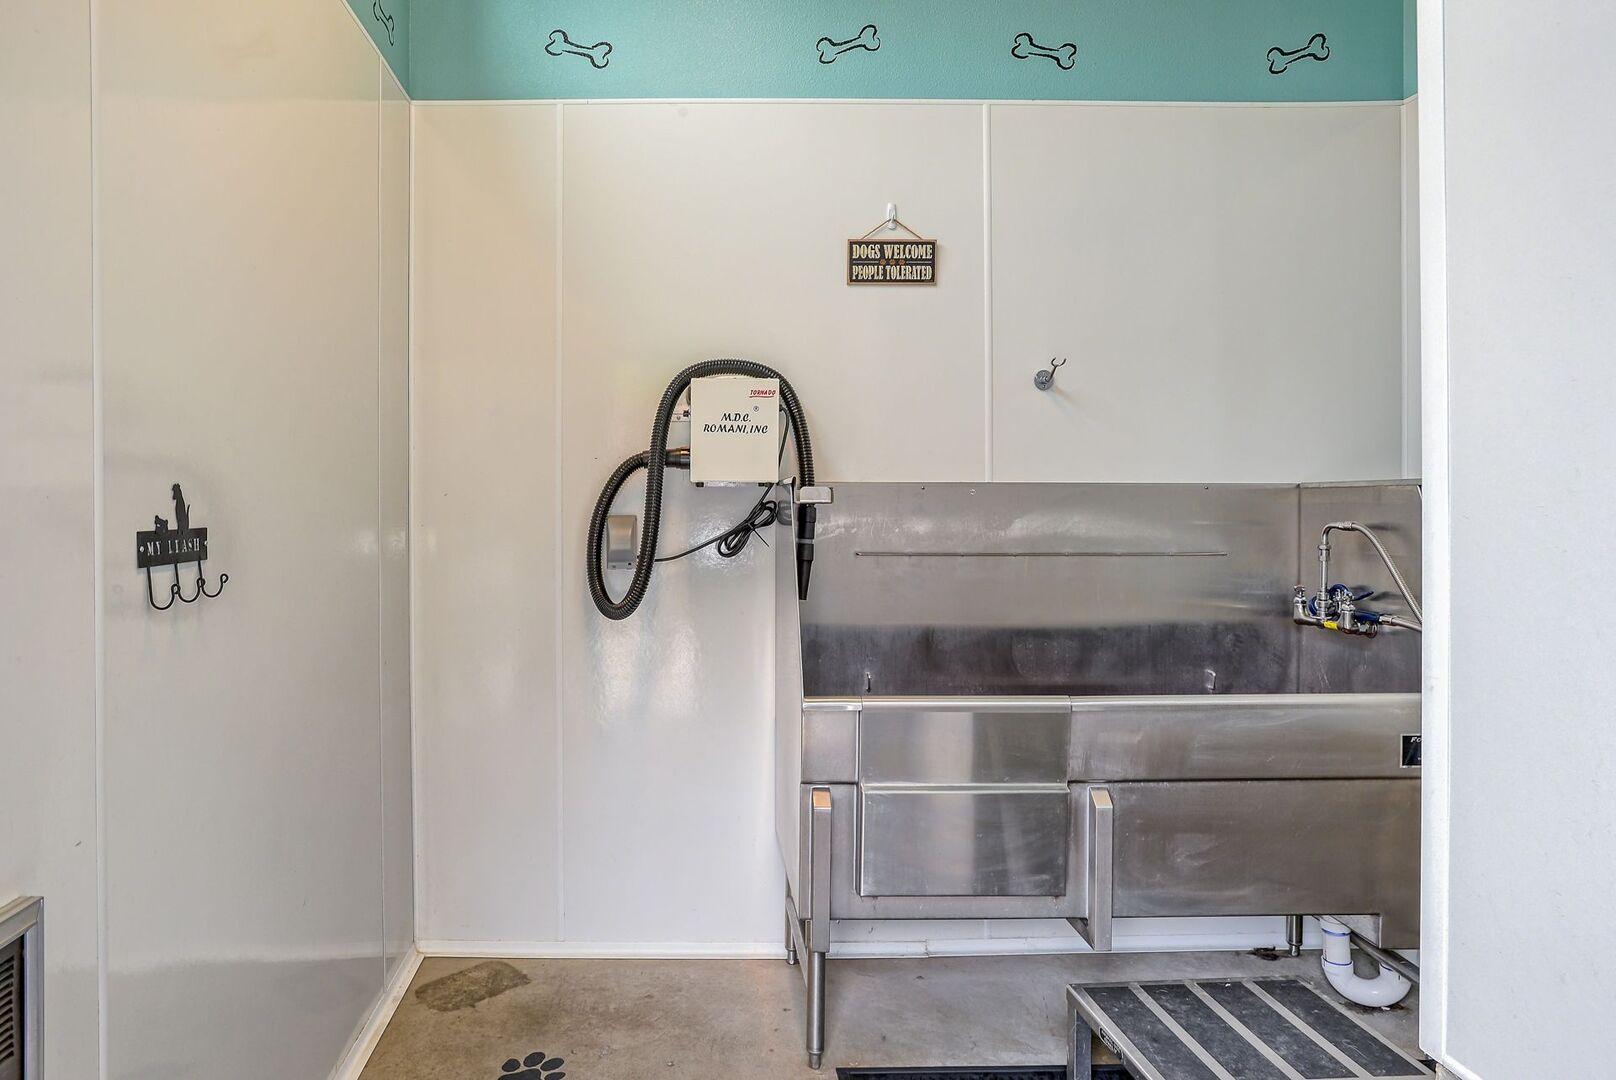 Ute creek renovated luxury apartments in longmont co solutioingenieria Choice Image